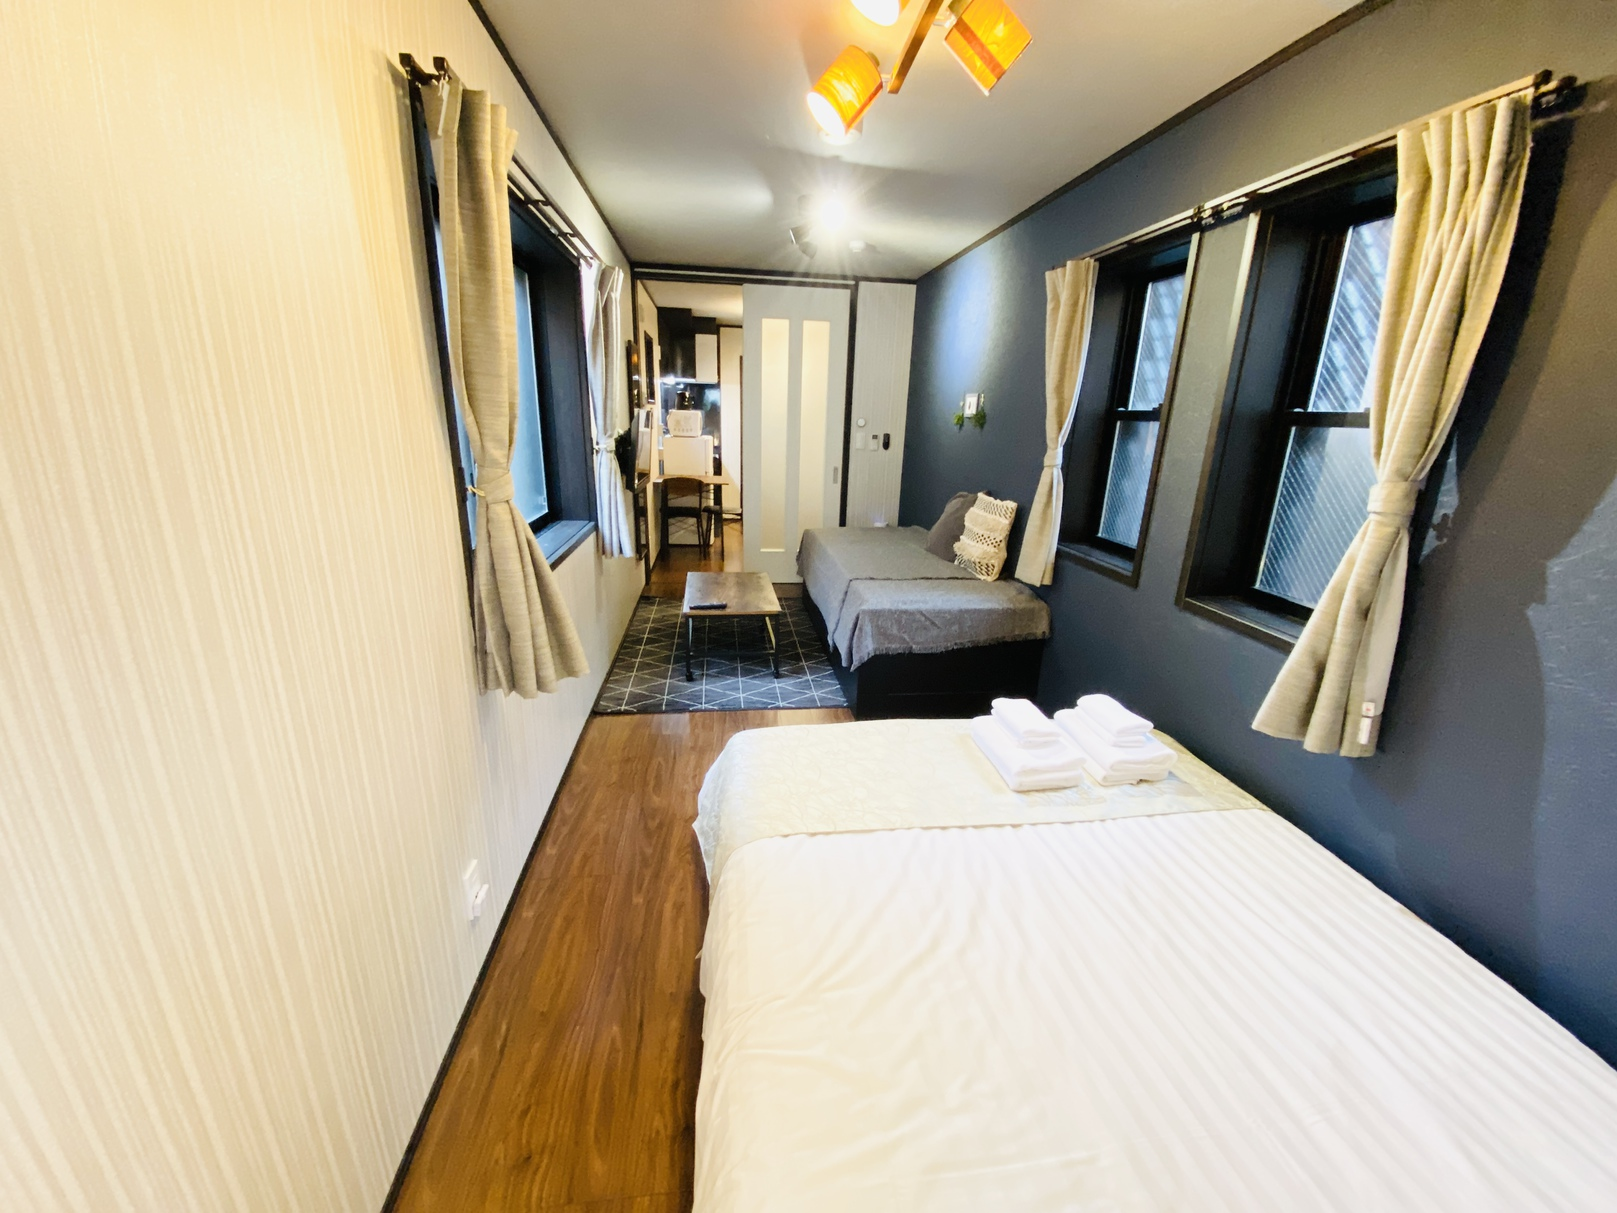 Room-3 (Room 101, 201, 301)